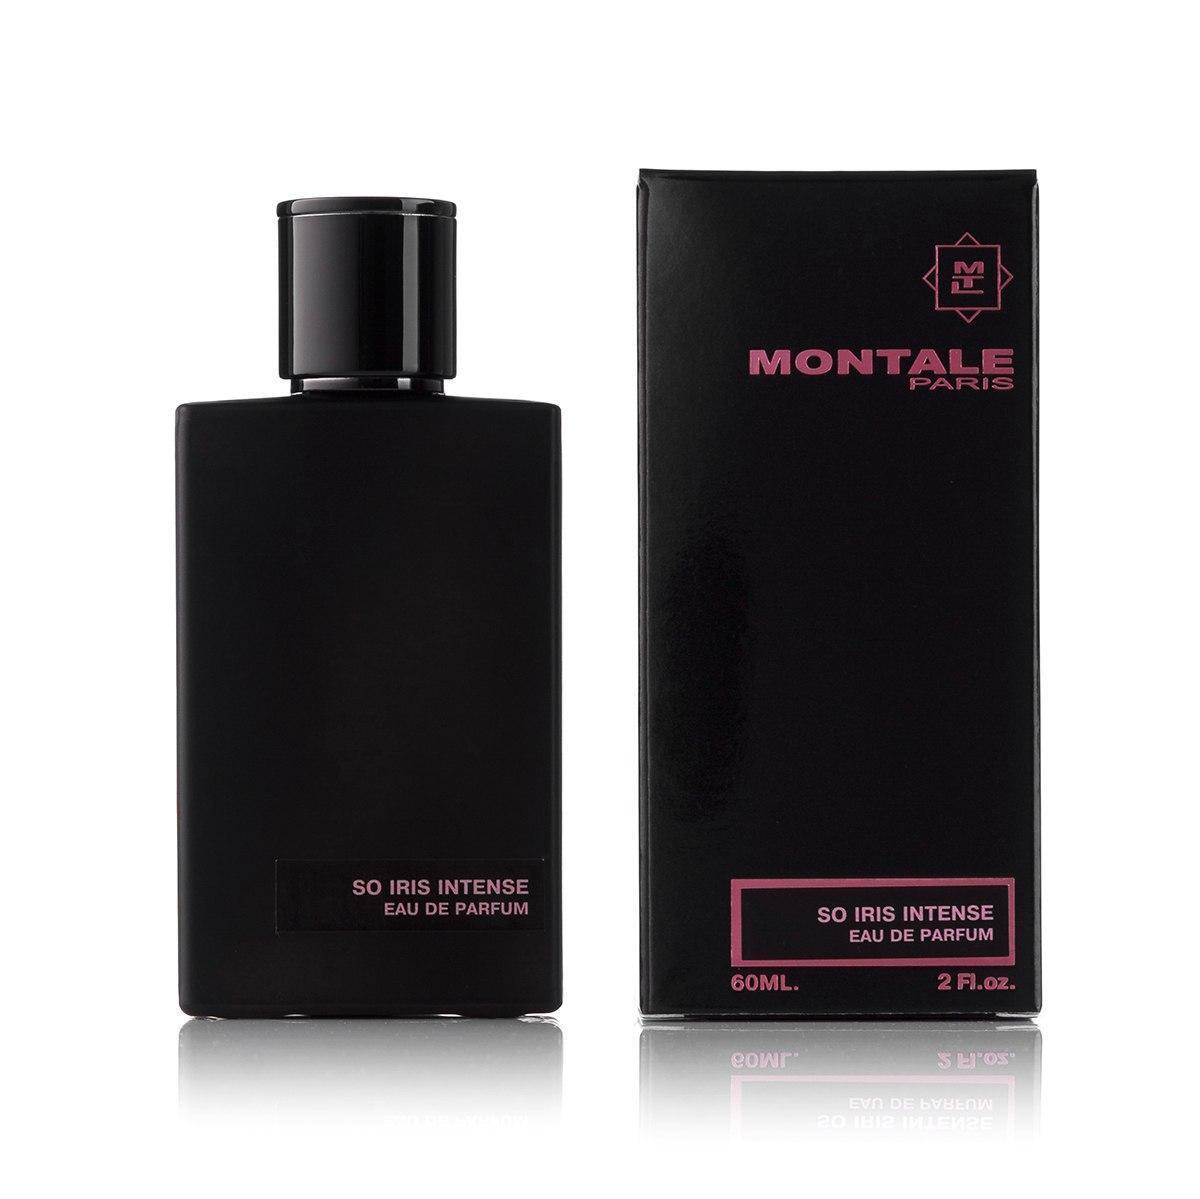 Мини парфюм Montale Intense So Iris (Унисекс) - 60 мл (M-22)